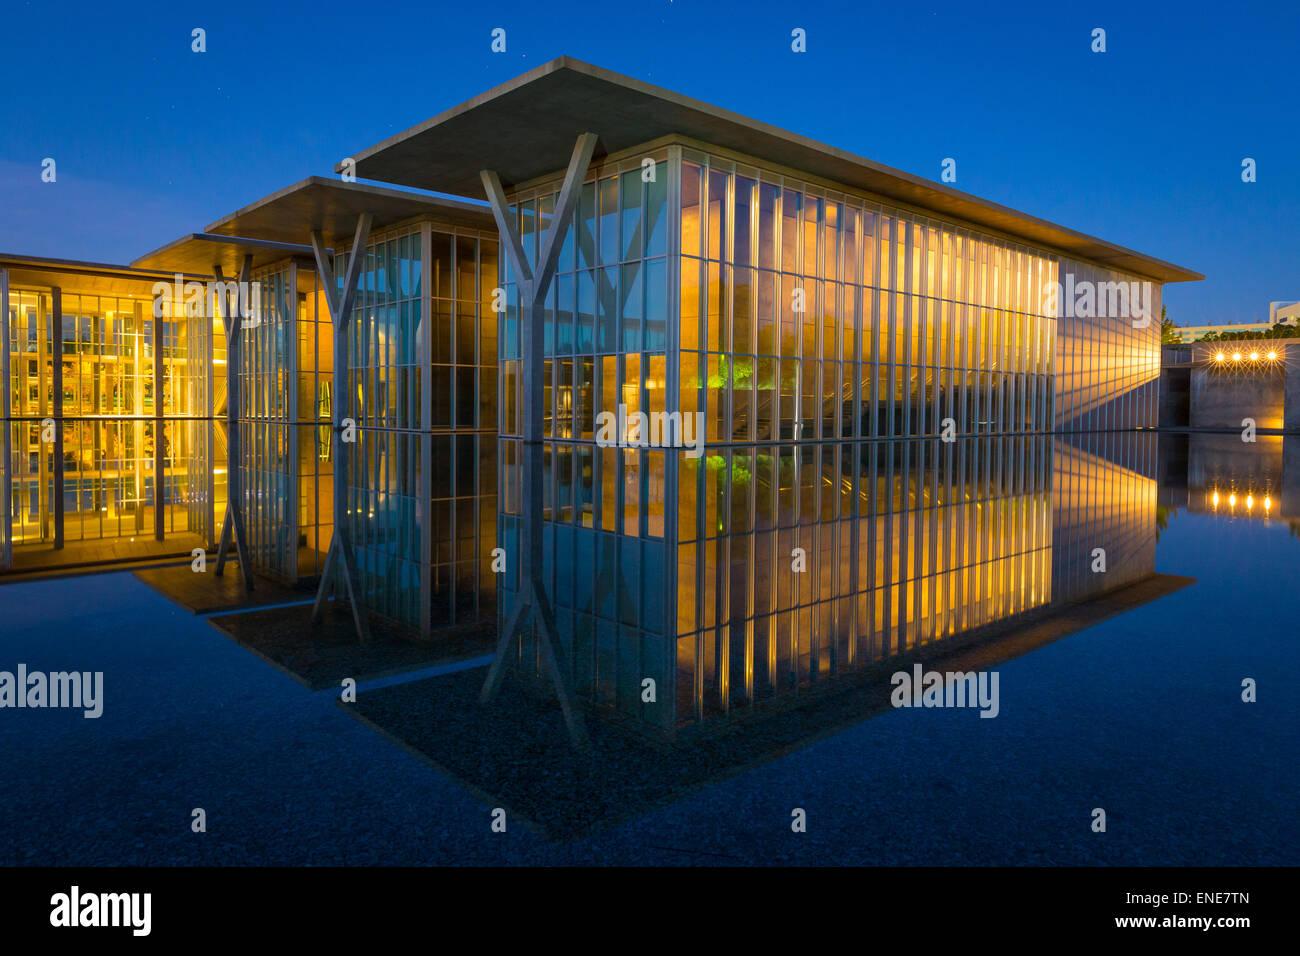 Museo de Arte Moderno en Fort Worth, Texas Imagen De Stock